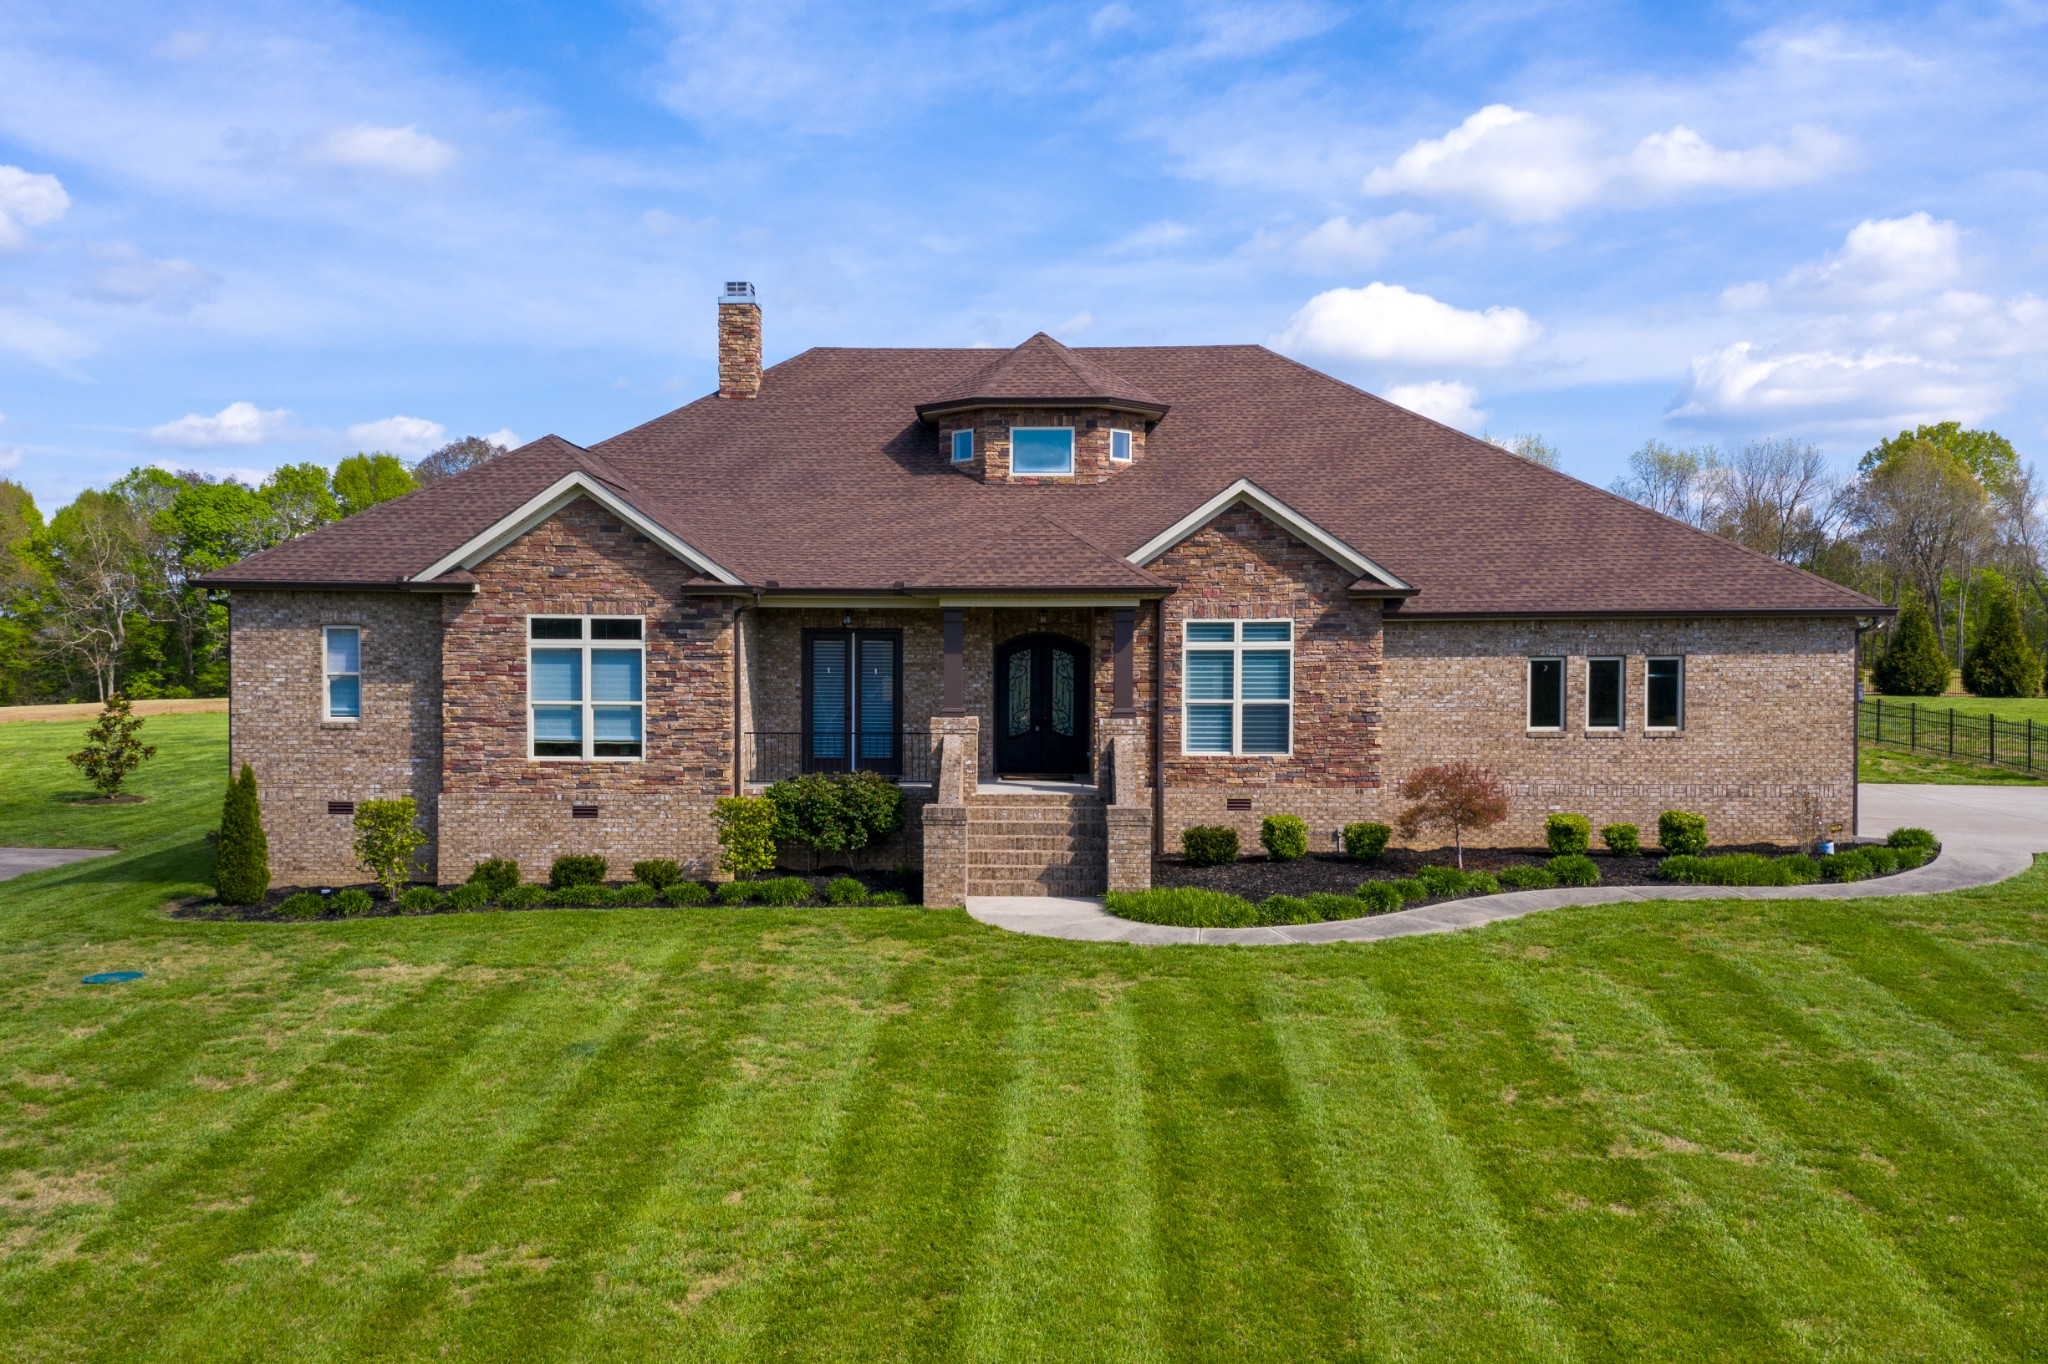 4015 Ironwood Dr, Greenbrier, TN 37073 - Greenbrier, TN real estate listing